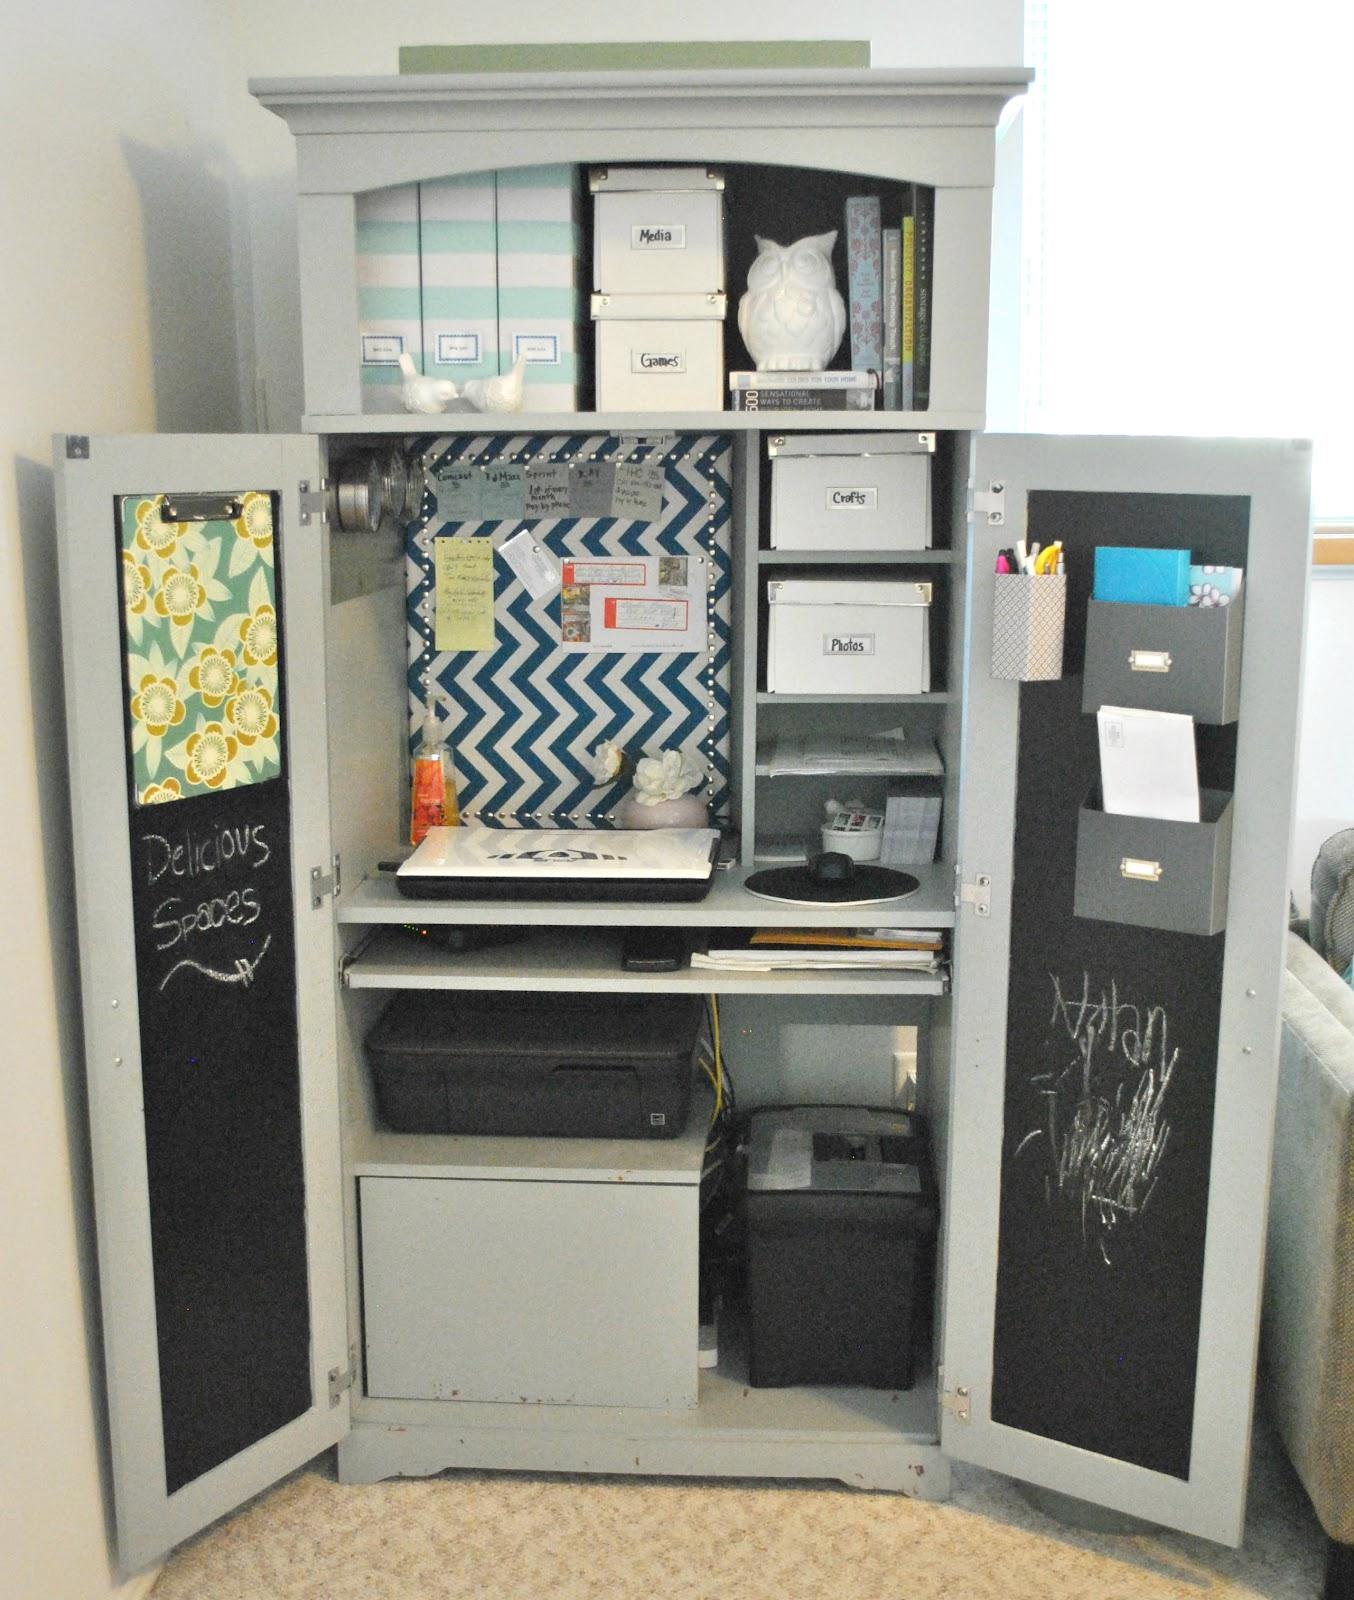 Delicious Spaces: {Armoire Desk Reveal}